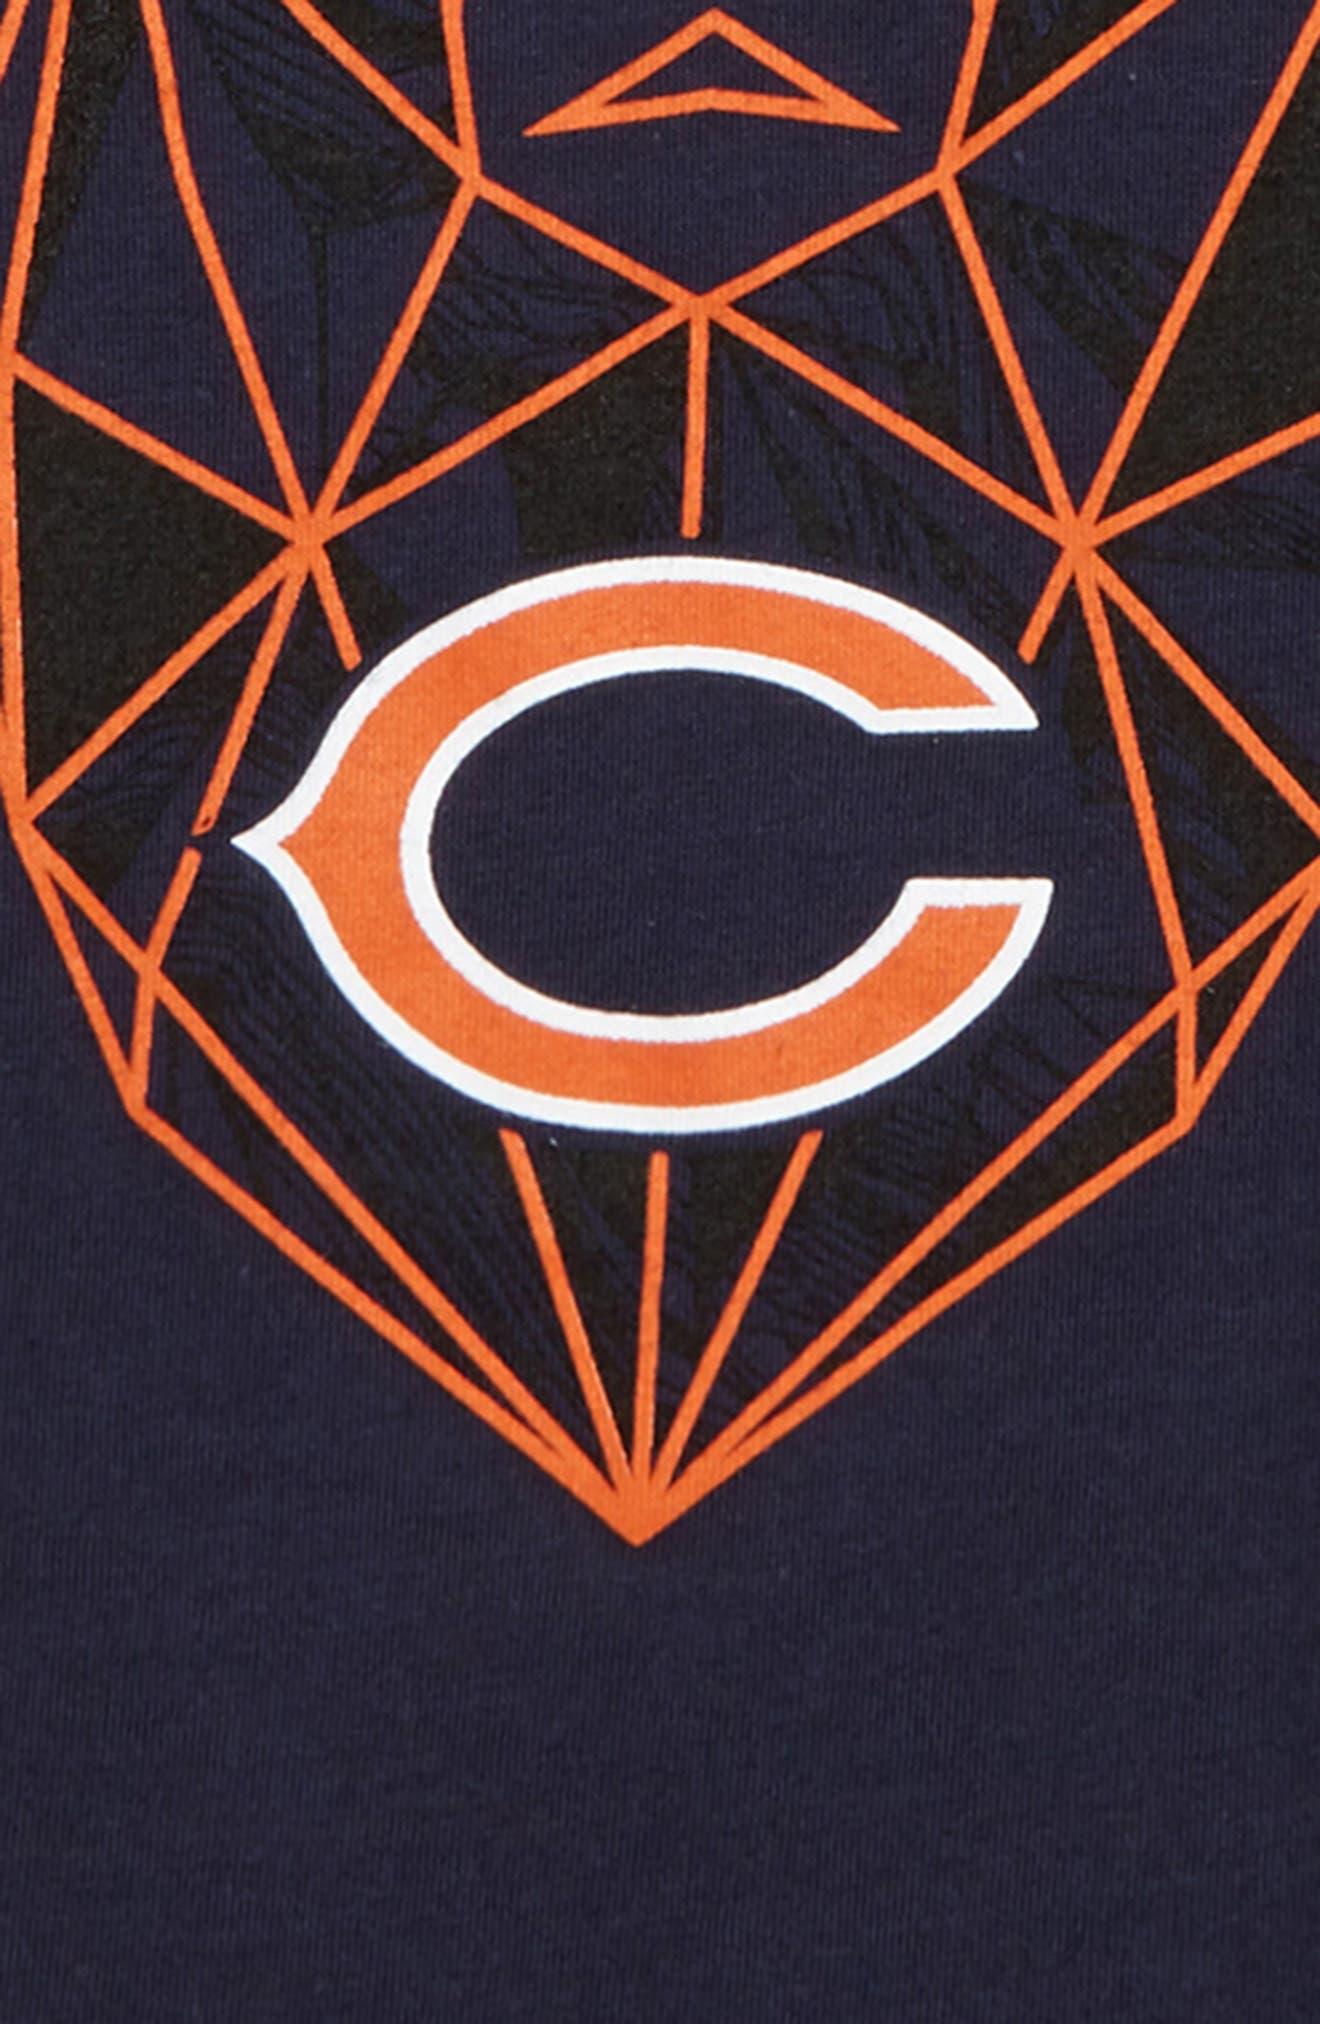 NFL Chicago Bears Dry Legend Lift T-Shirt,                             Alternate thumbnail 2, color,                             410